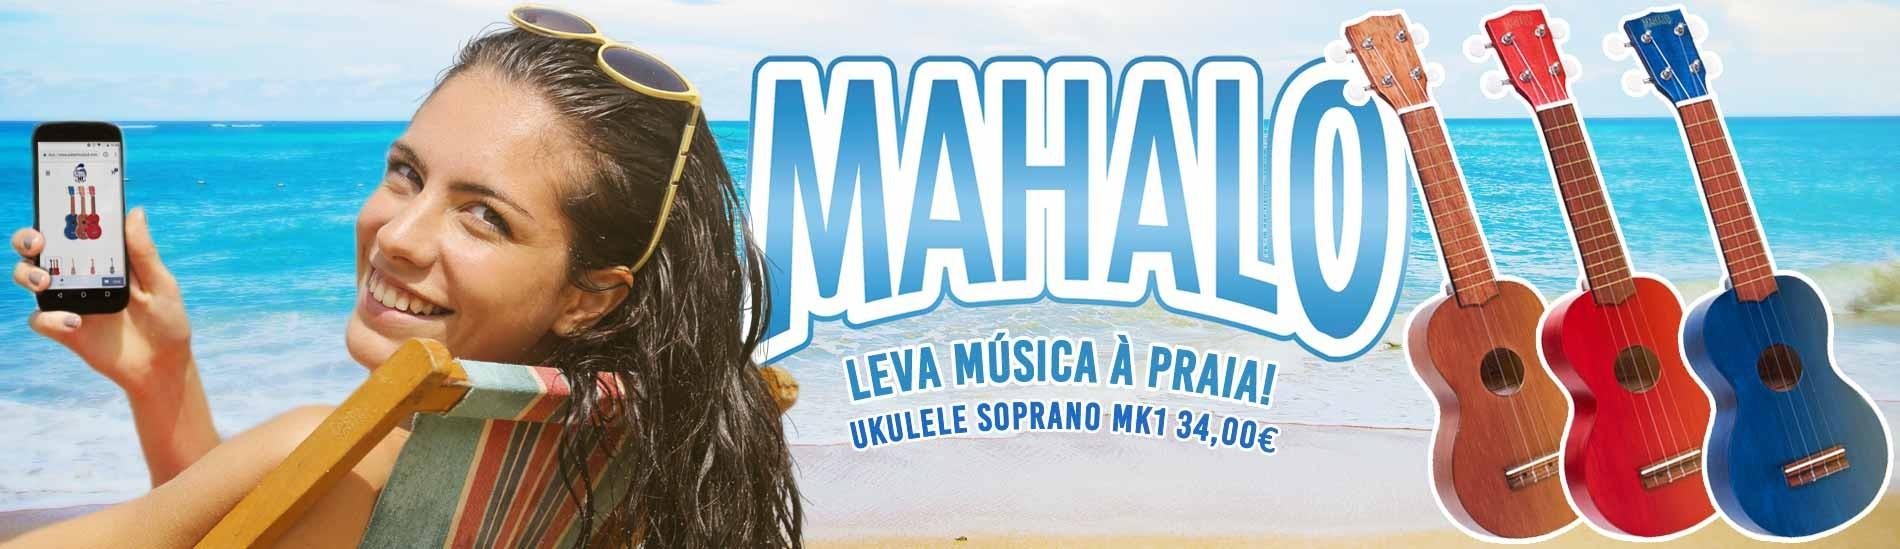 Ukuleles Soprano Mahalo MK1 - Leva música à praia!